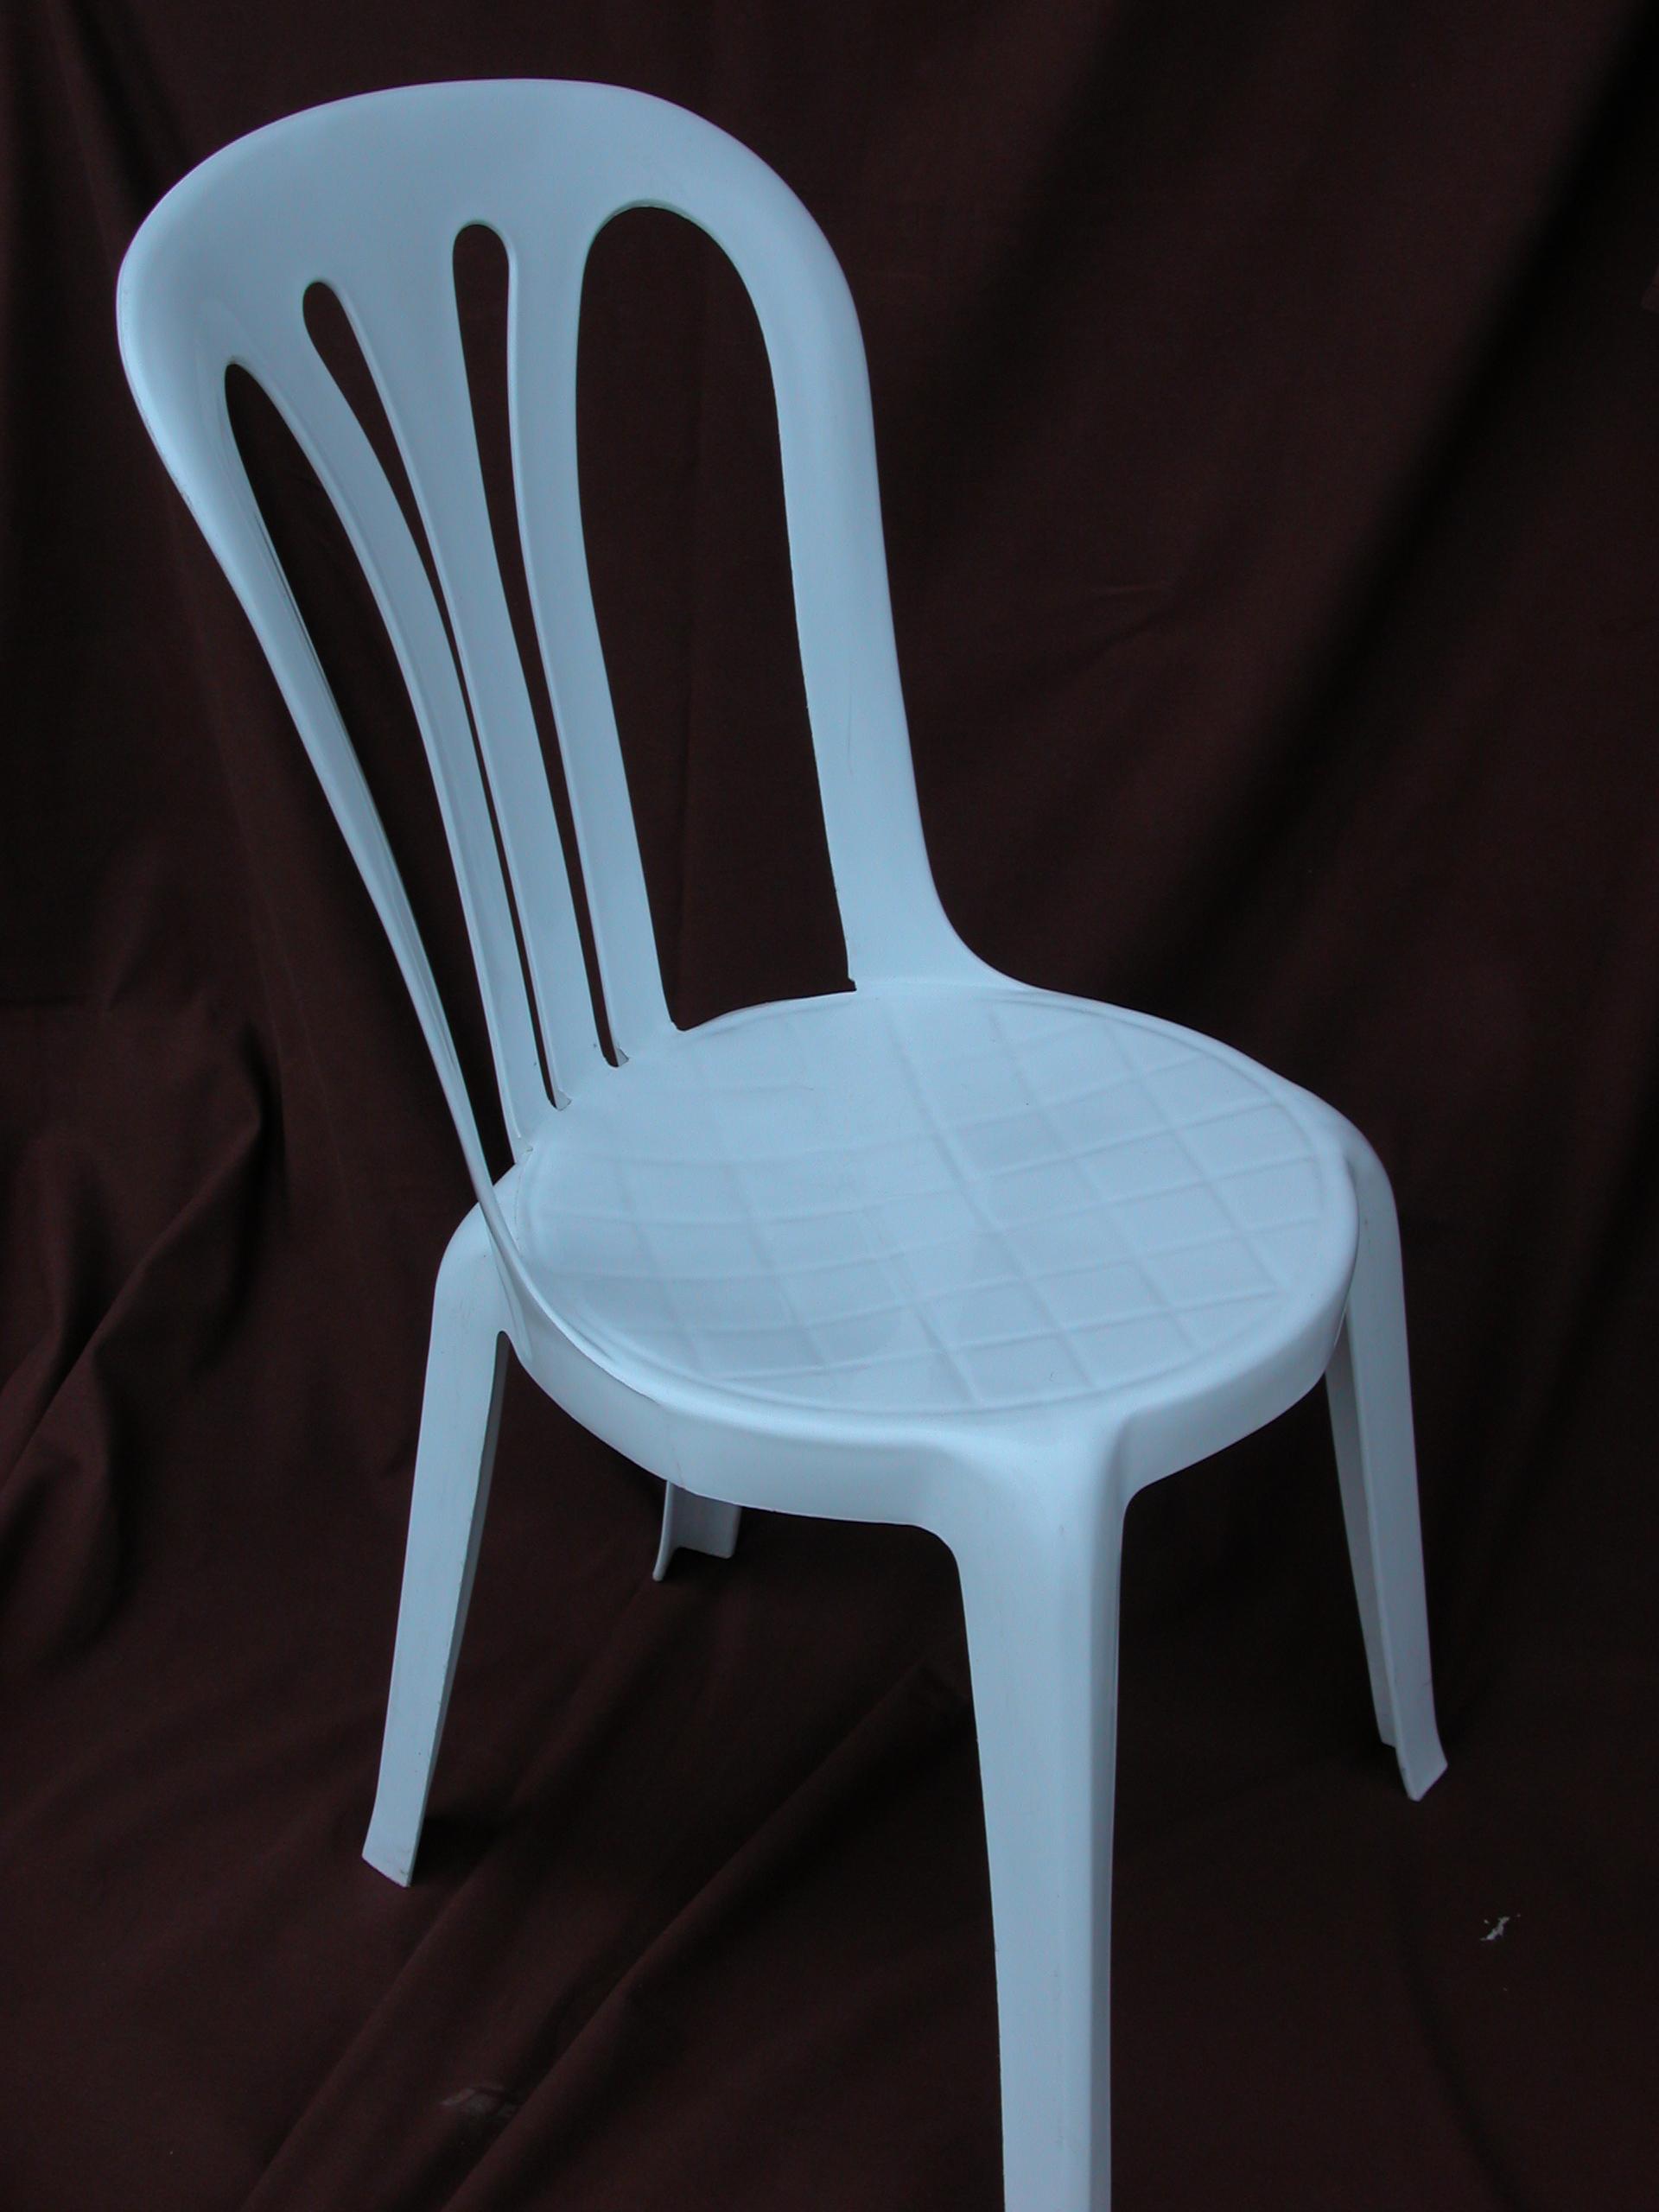 le mobilier chaises steph comminges location. Black Bedroom Furniture Sets. Home Design Ideas